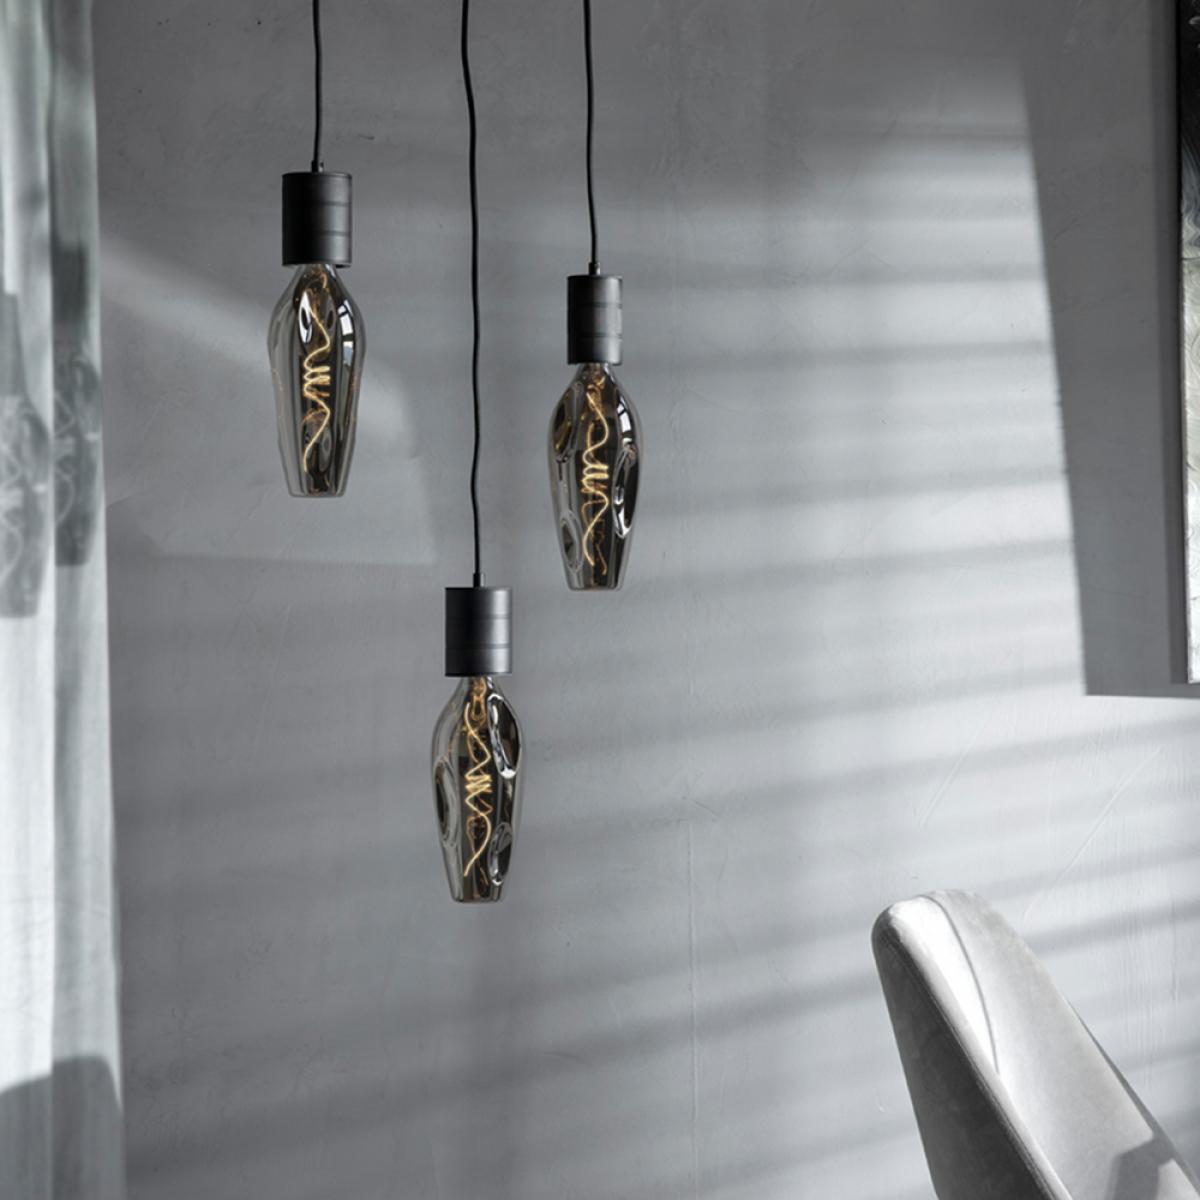 XXL Design LED Glühbirne Barcelona- Stilvolle und dimmbare Lampe